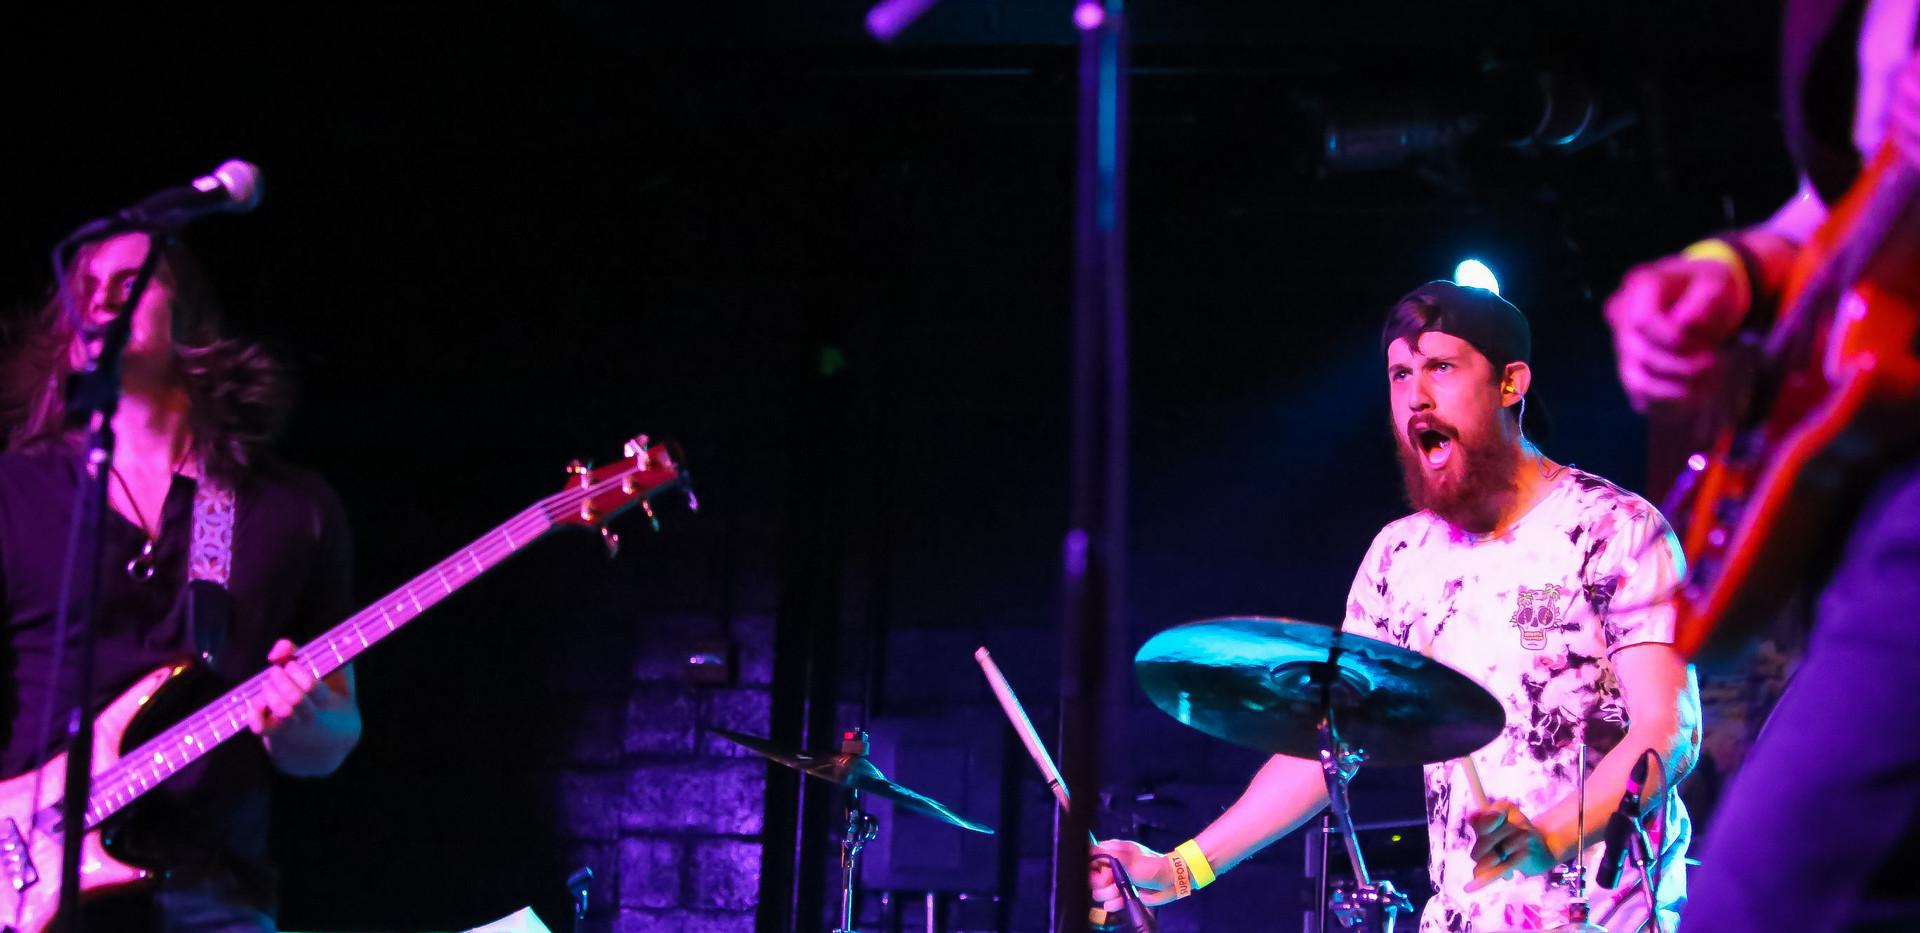 Jon McCann, Drummer